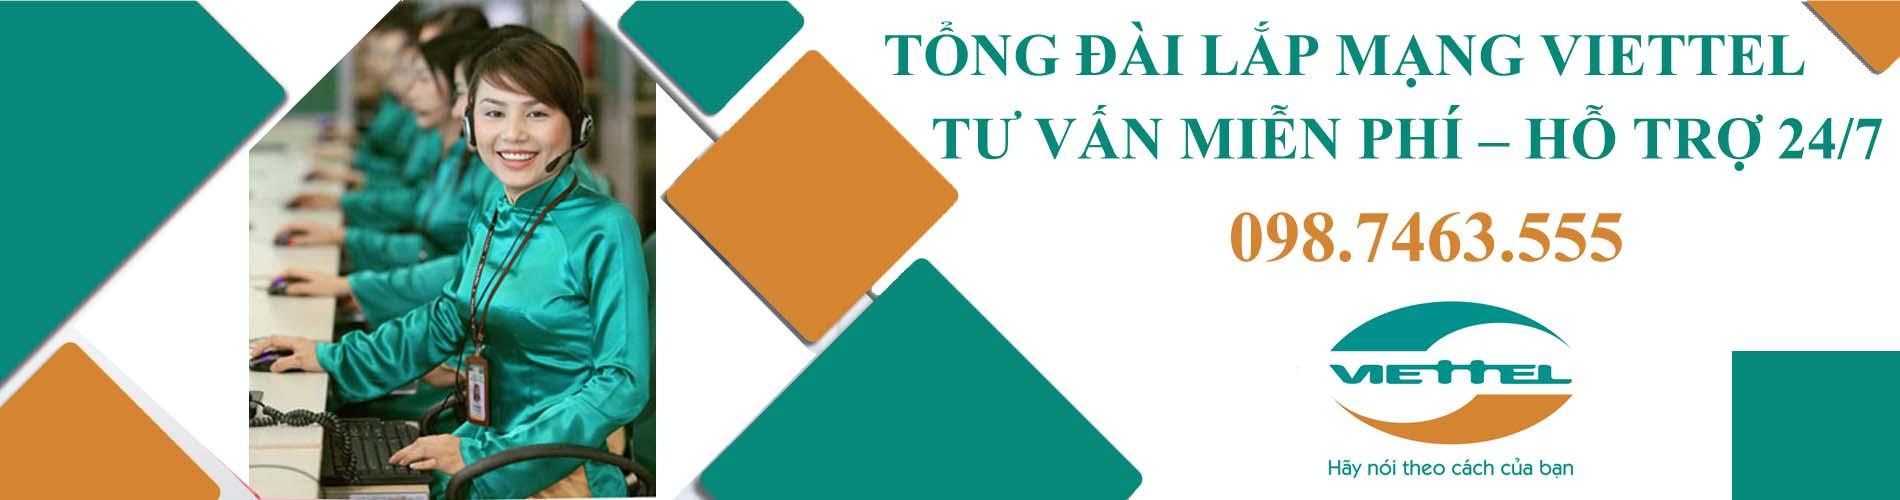 tong-dai-lap-mang-viettel